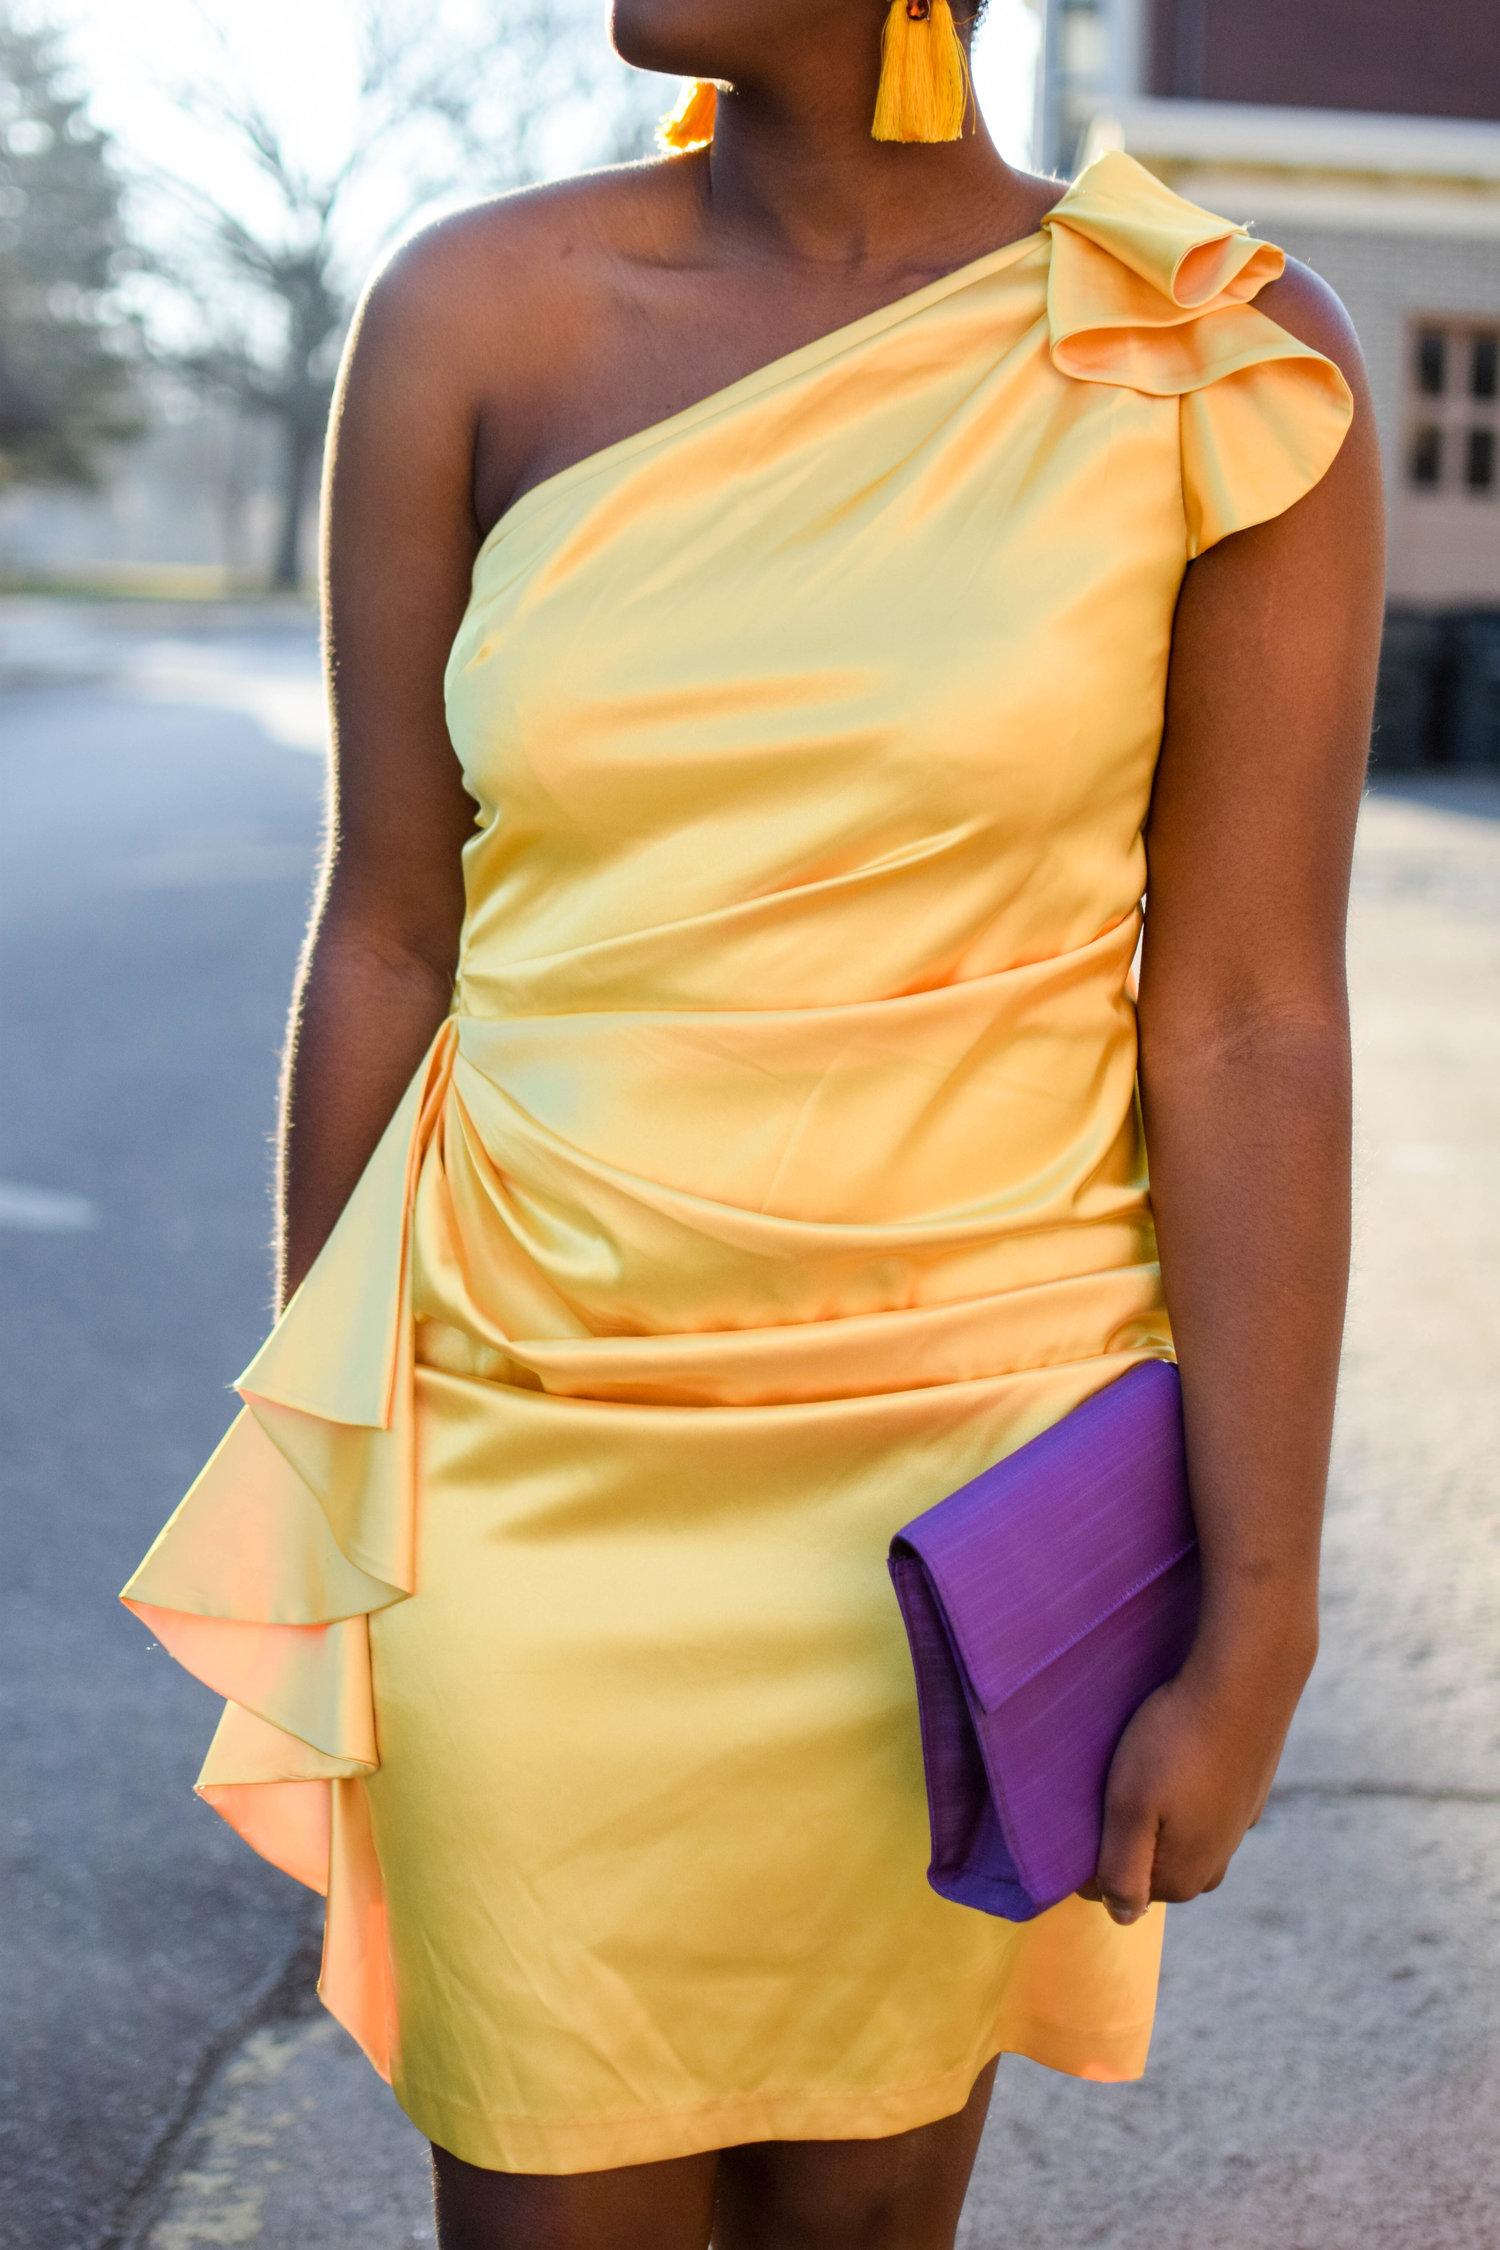 The Stunning Canary Yellow Dress.